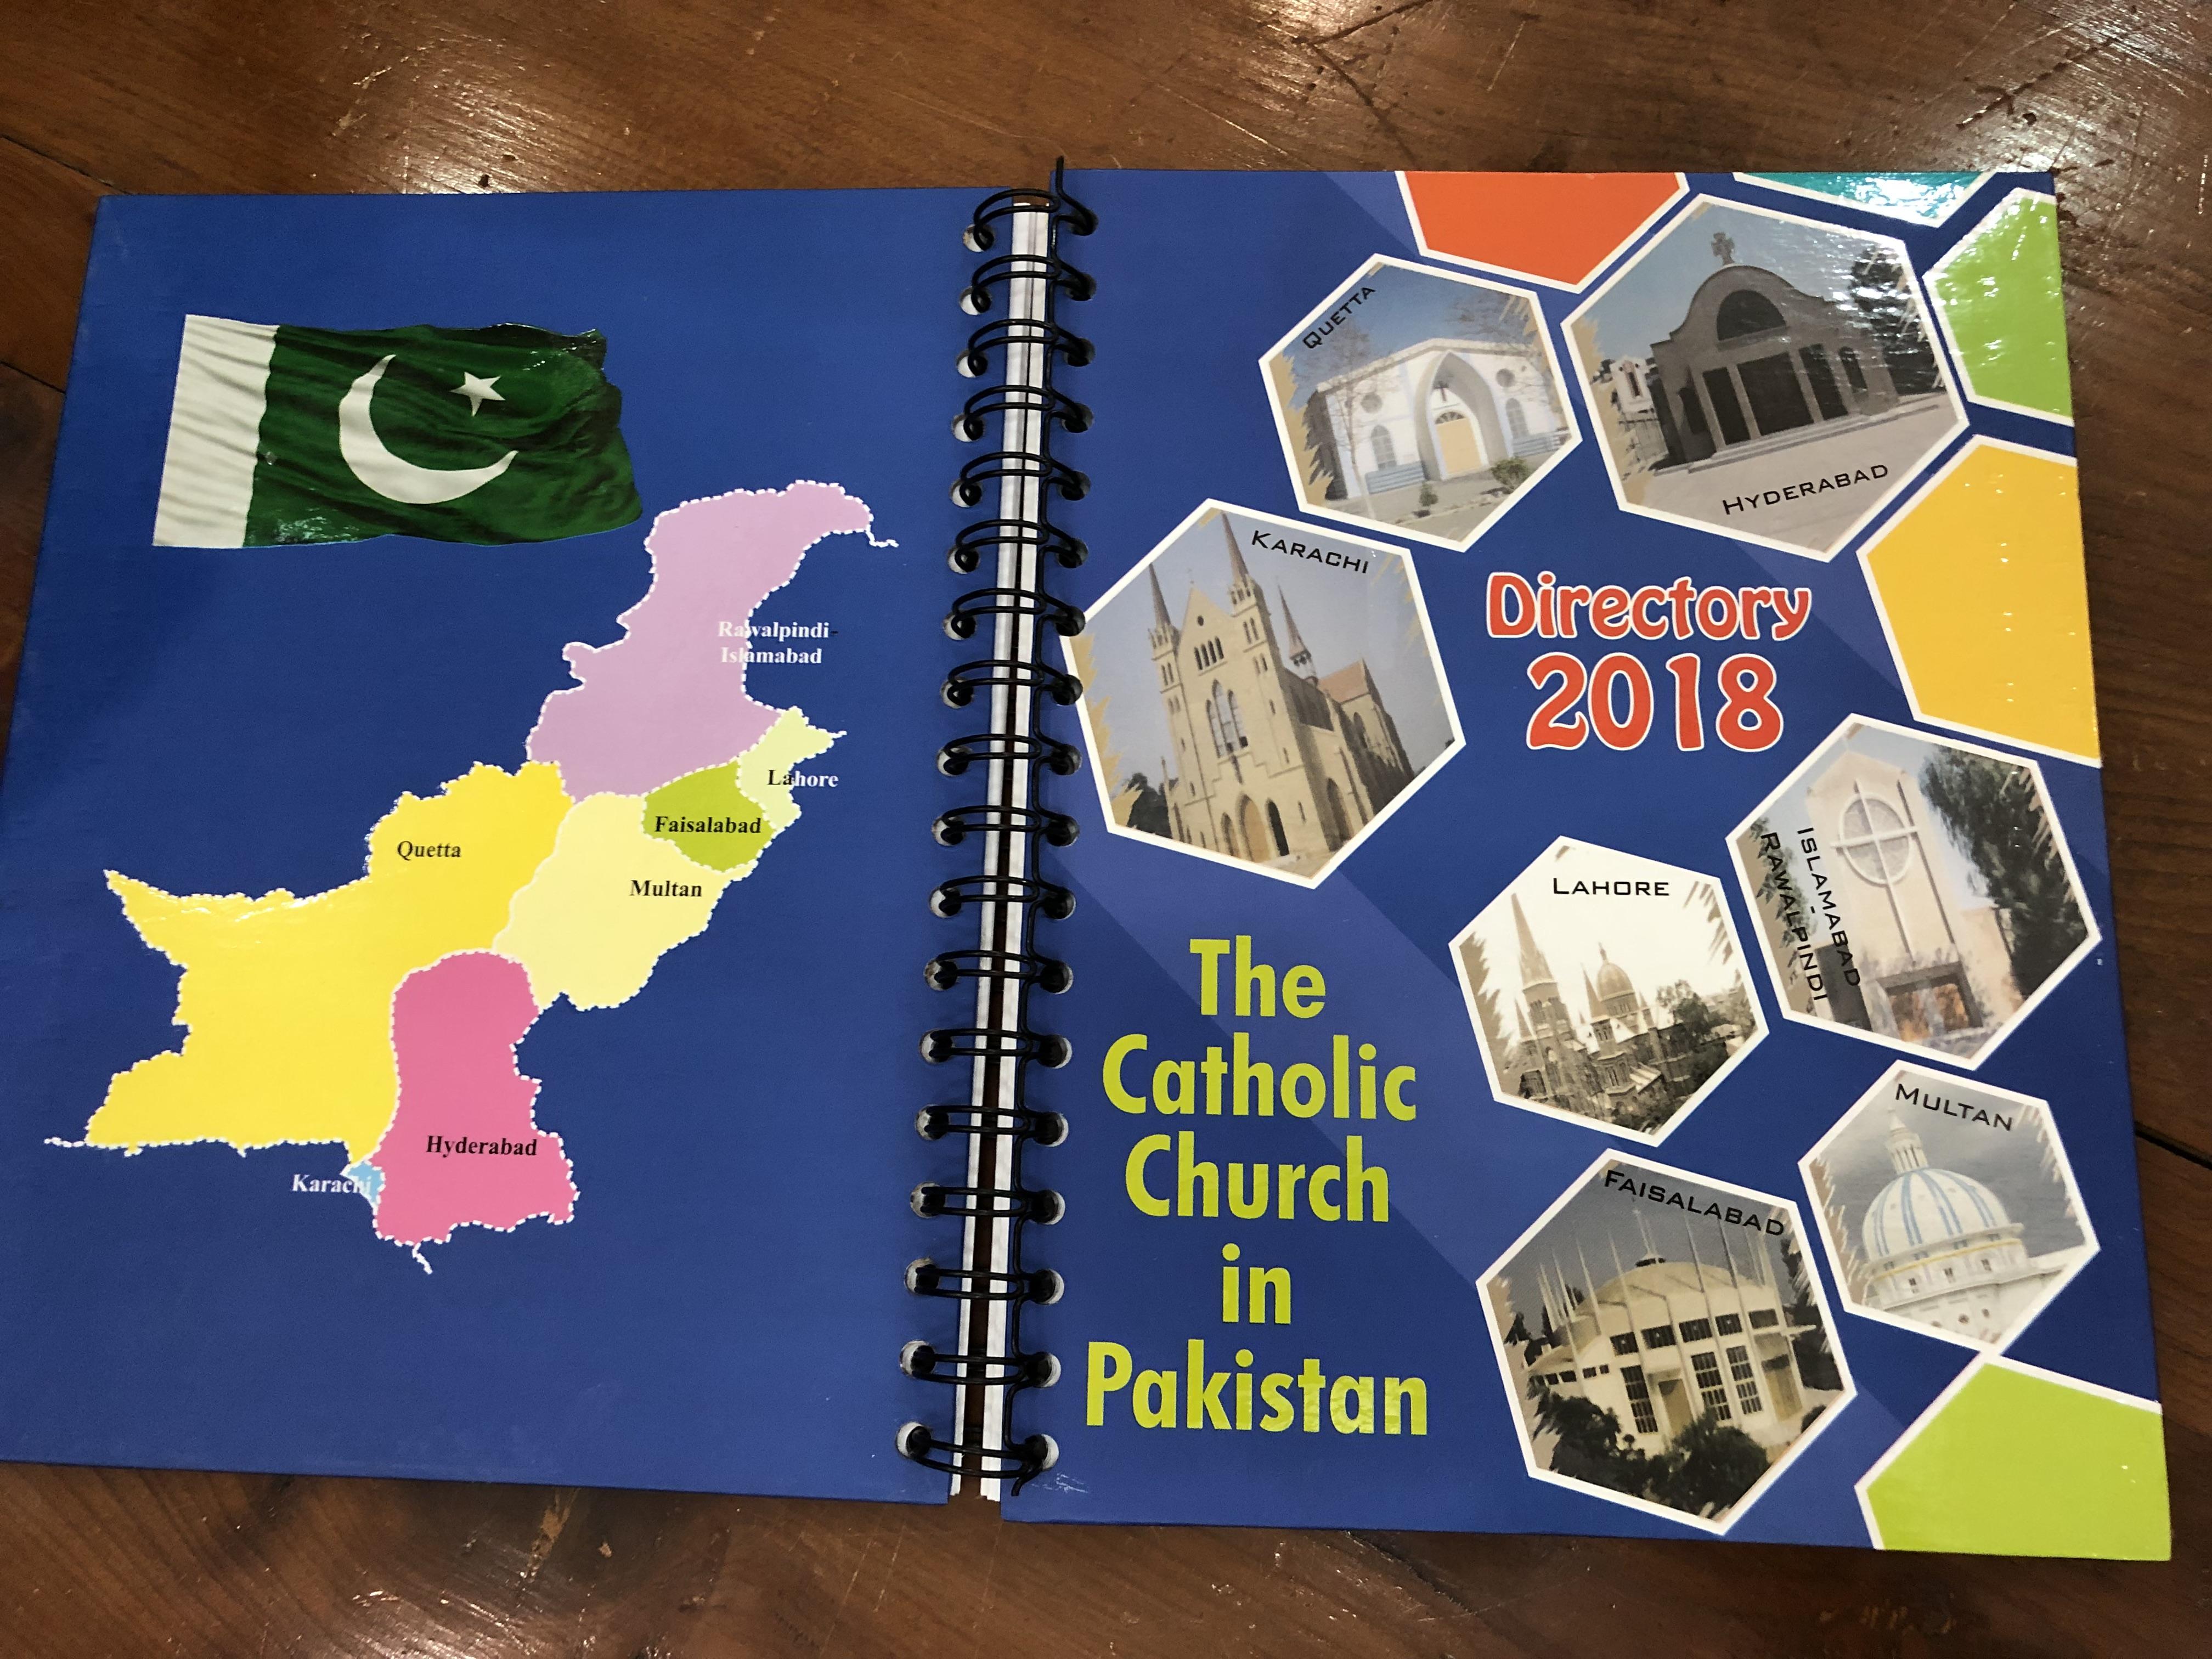 the-catholic-church-in-pakistan-directory-2018-karachi-quetta-hyderabad-lahore-islamabad-faisalabad-multan-catholic-directory-of-pakistan-churches-catholic-bible-commission-pakistan-19-.jpg